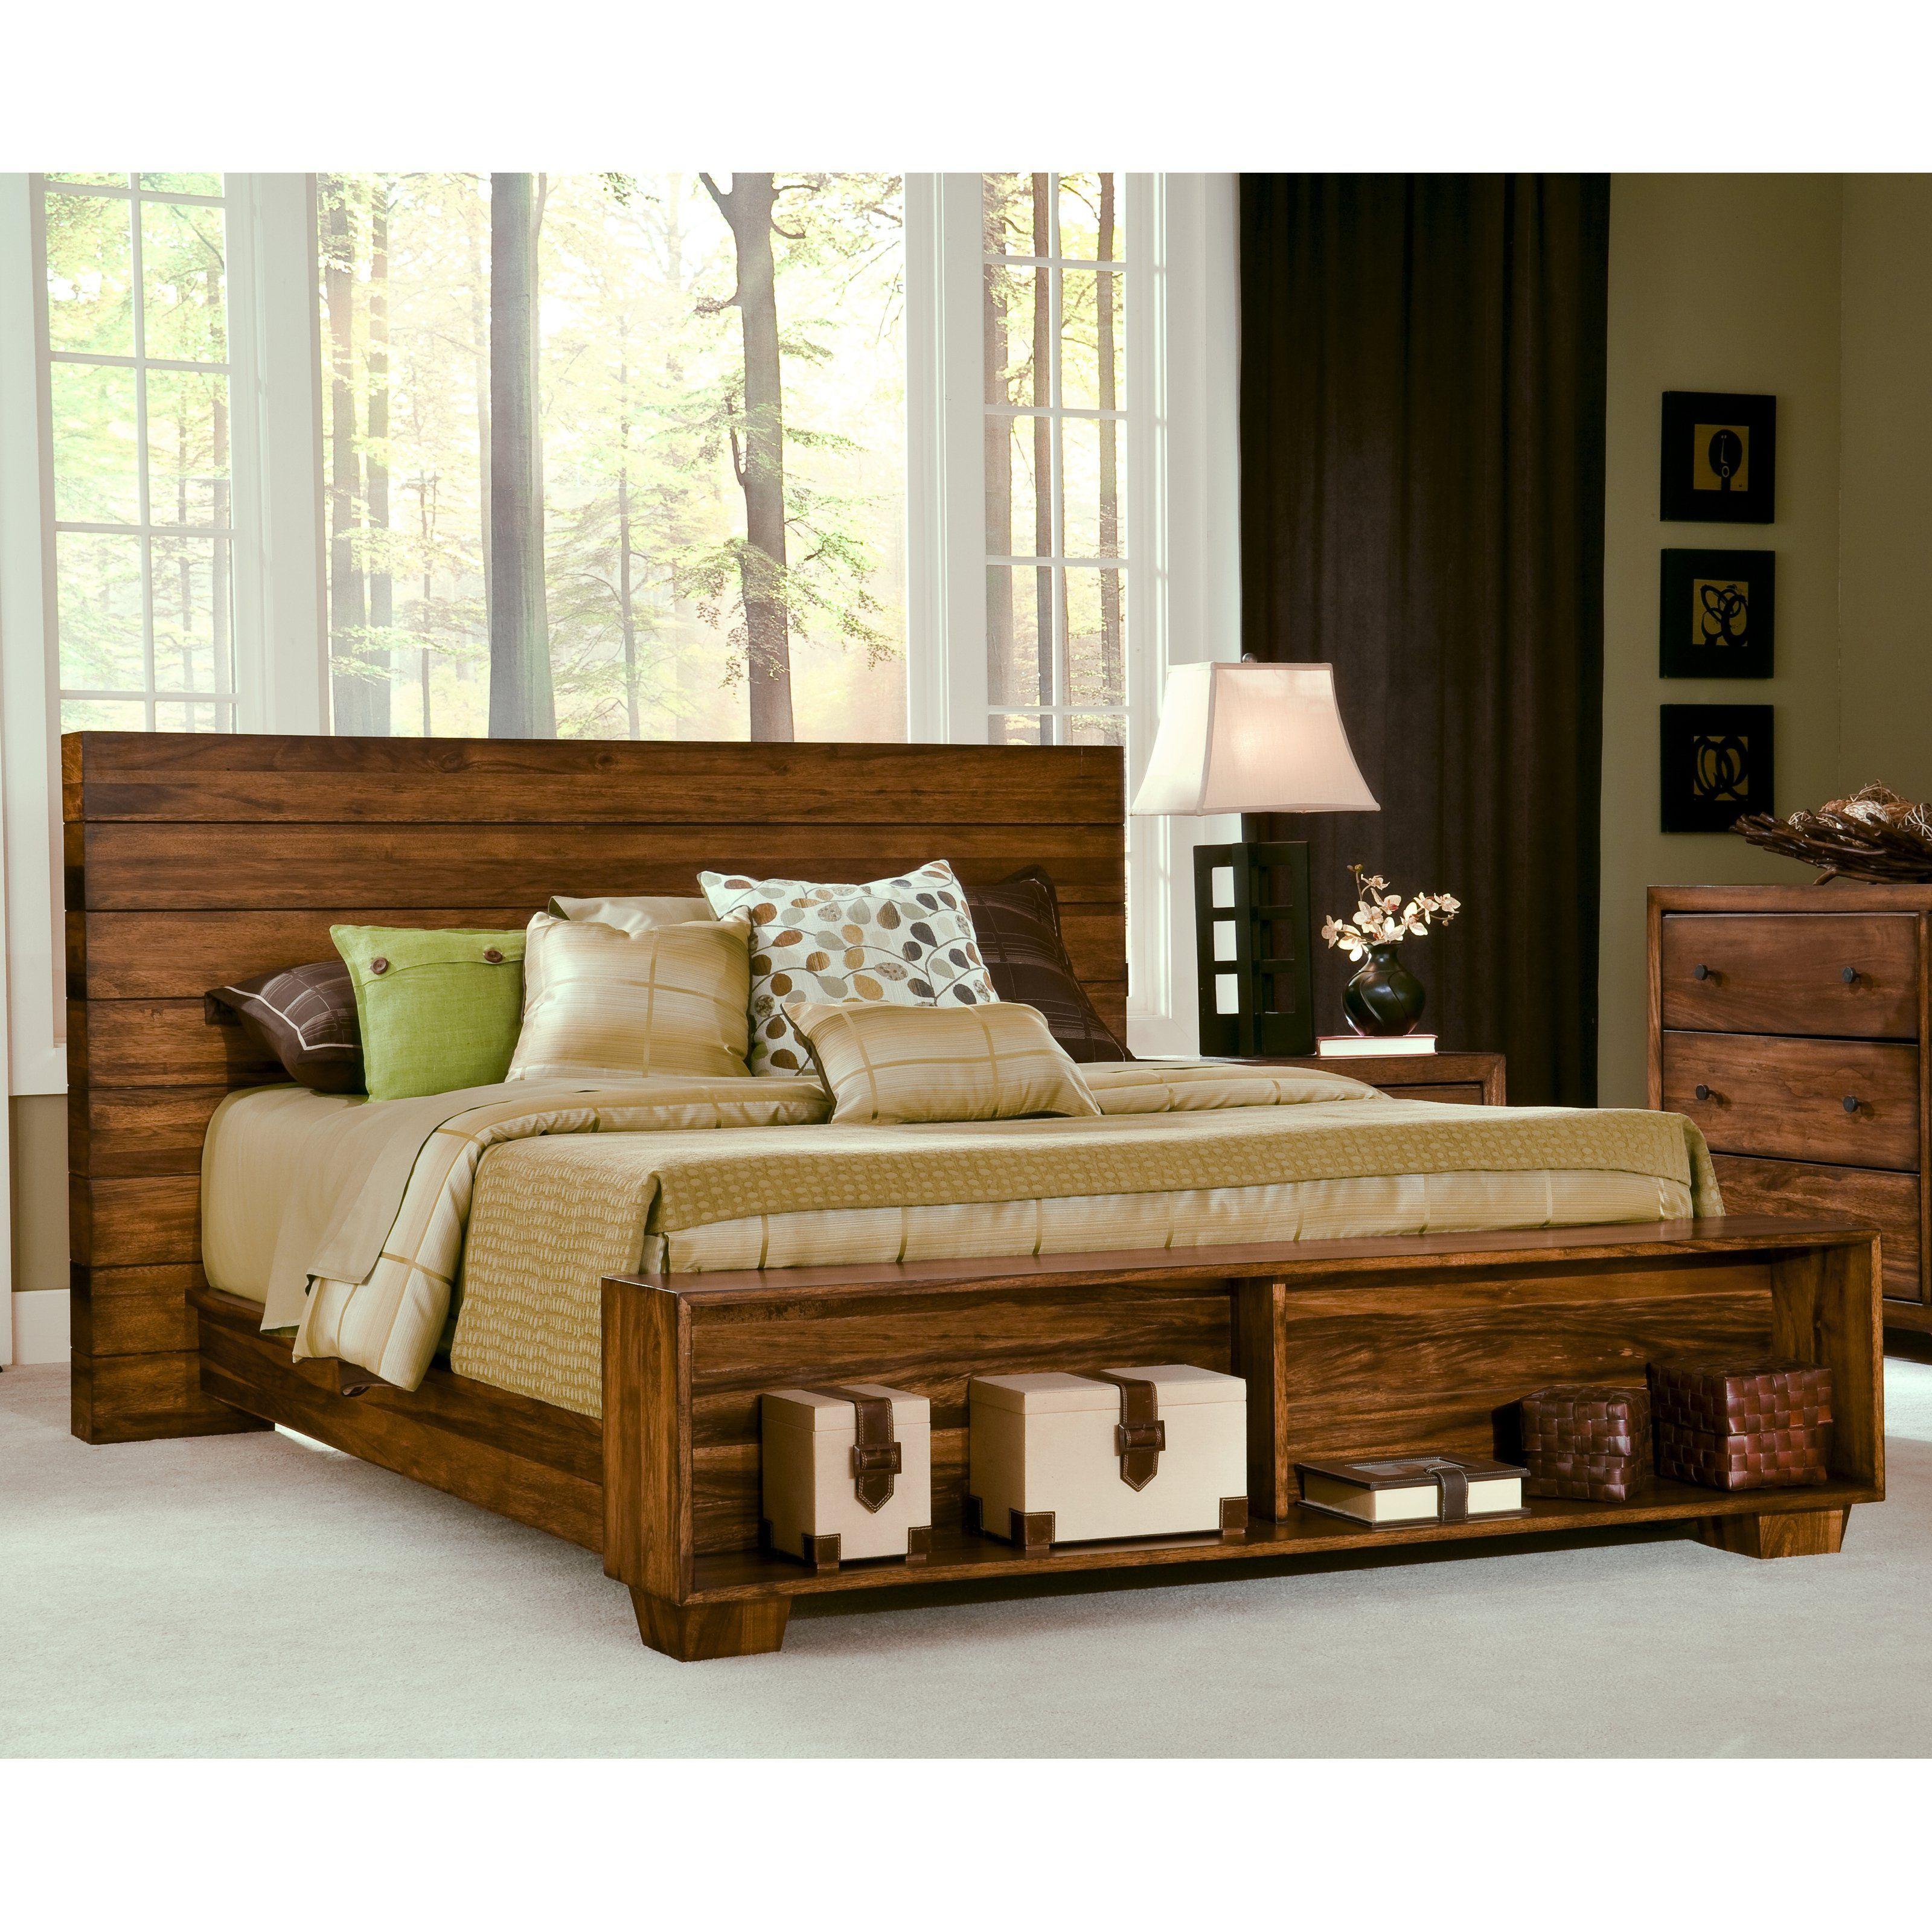 Cal King Bedroom Furniture Set PierPointSpringscom